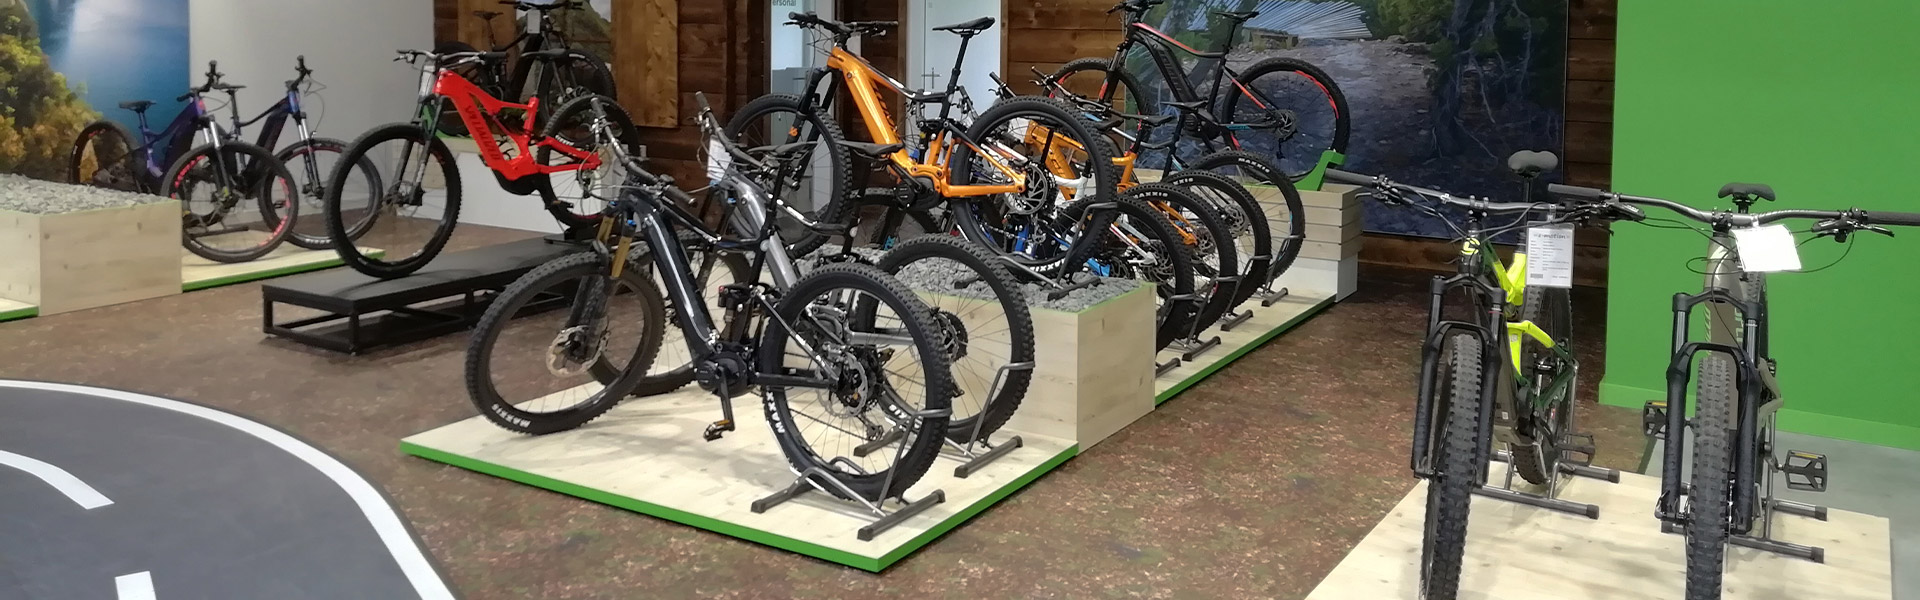 Der Shop der e-motion e-Bike Welt Hanau